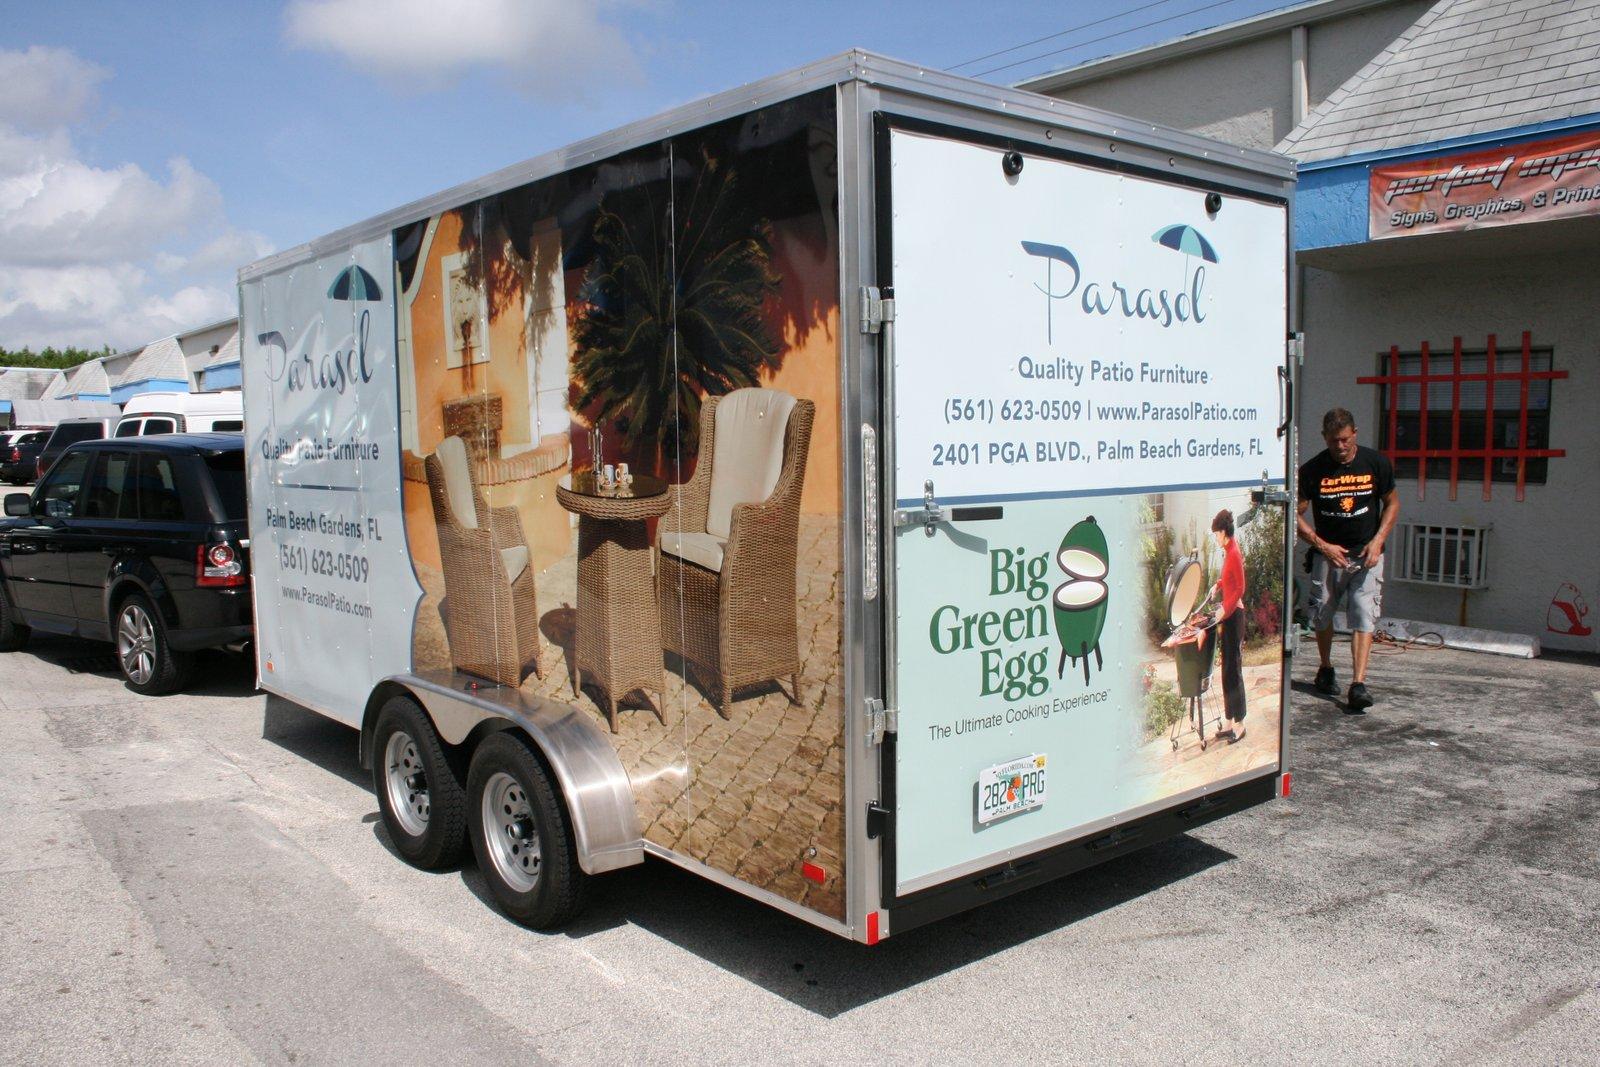 Trailer Wrap Palm Beach Gardens Fl For Parasol Patio Furniture 3m Certified Car Wrap Solutions